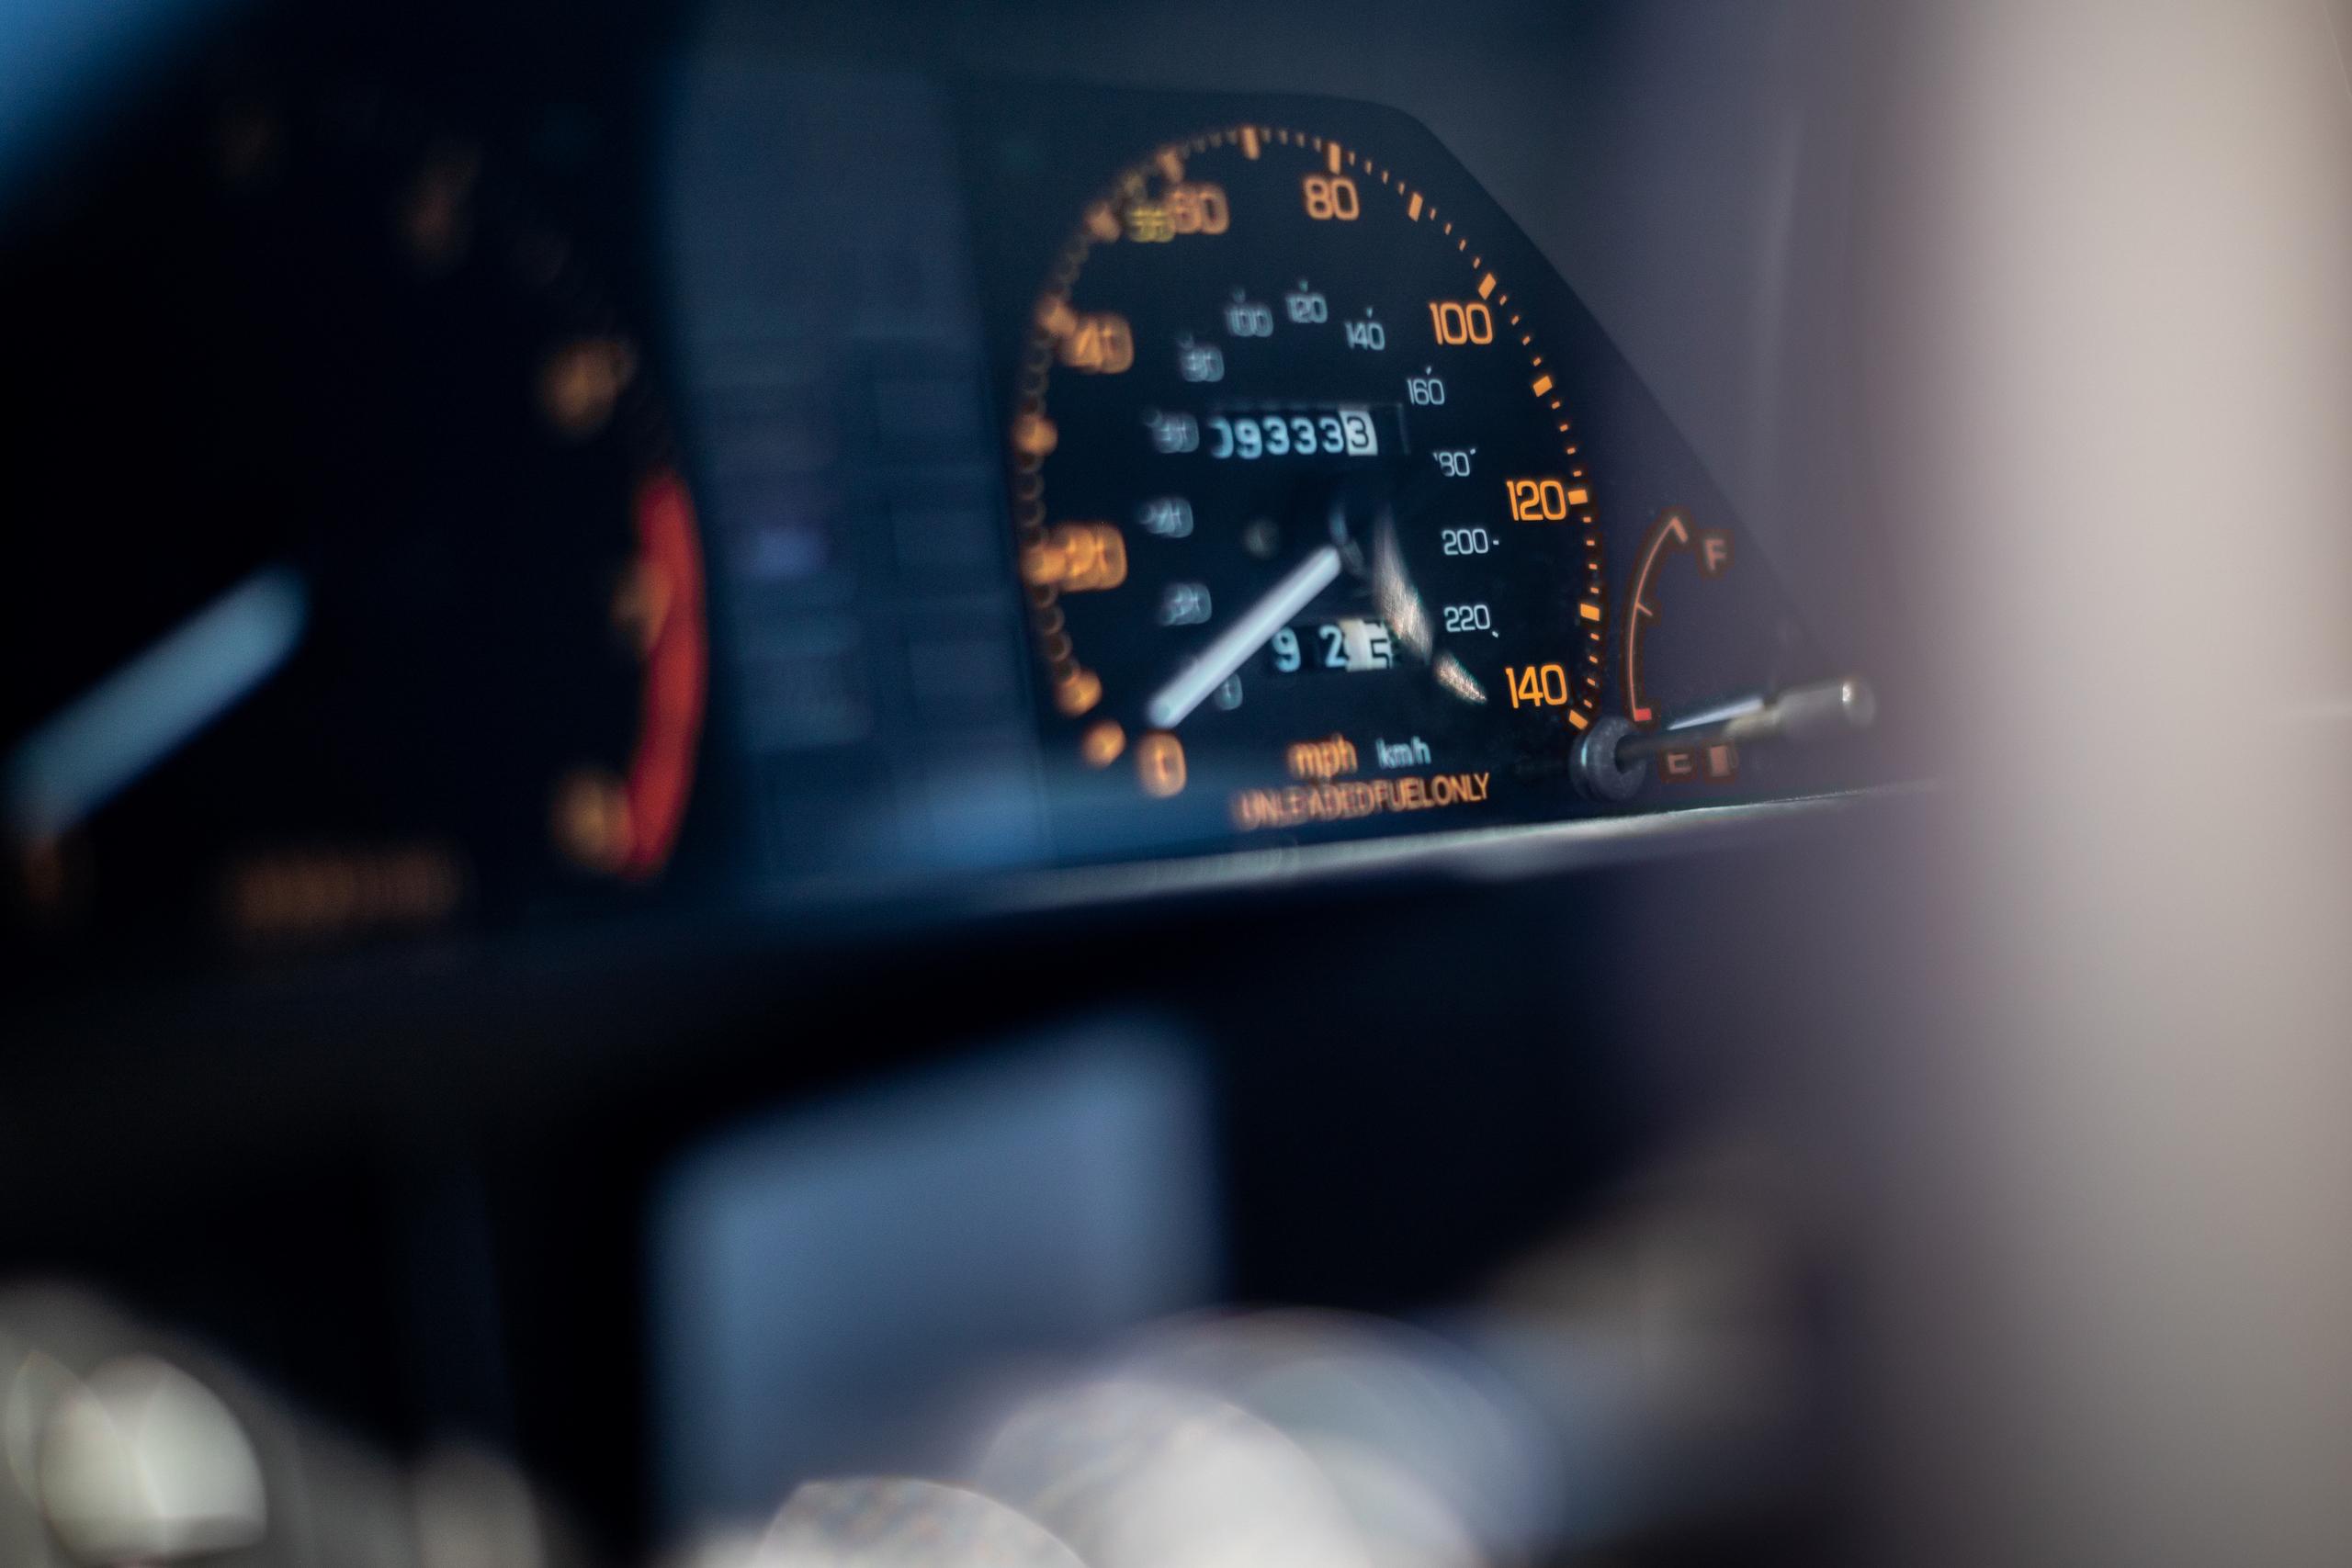 1985 CRX Si dash speedometer